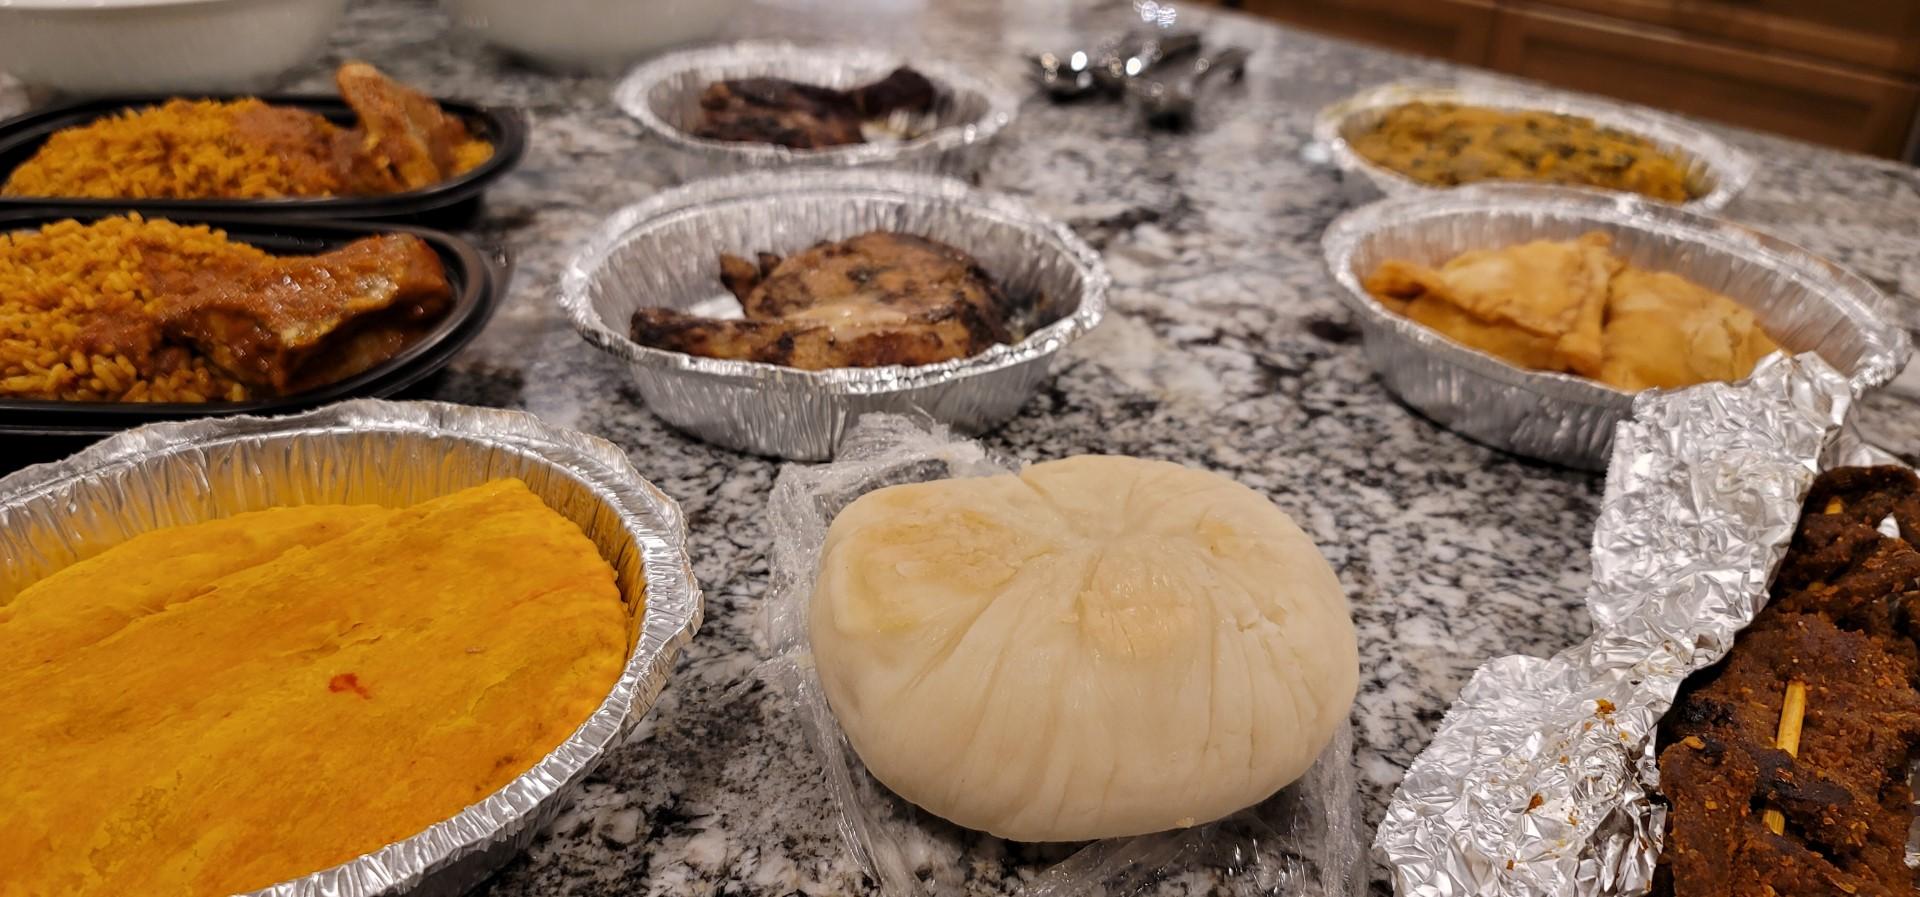 nigerian food in ontario